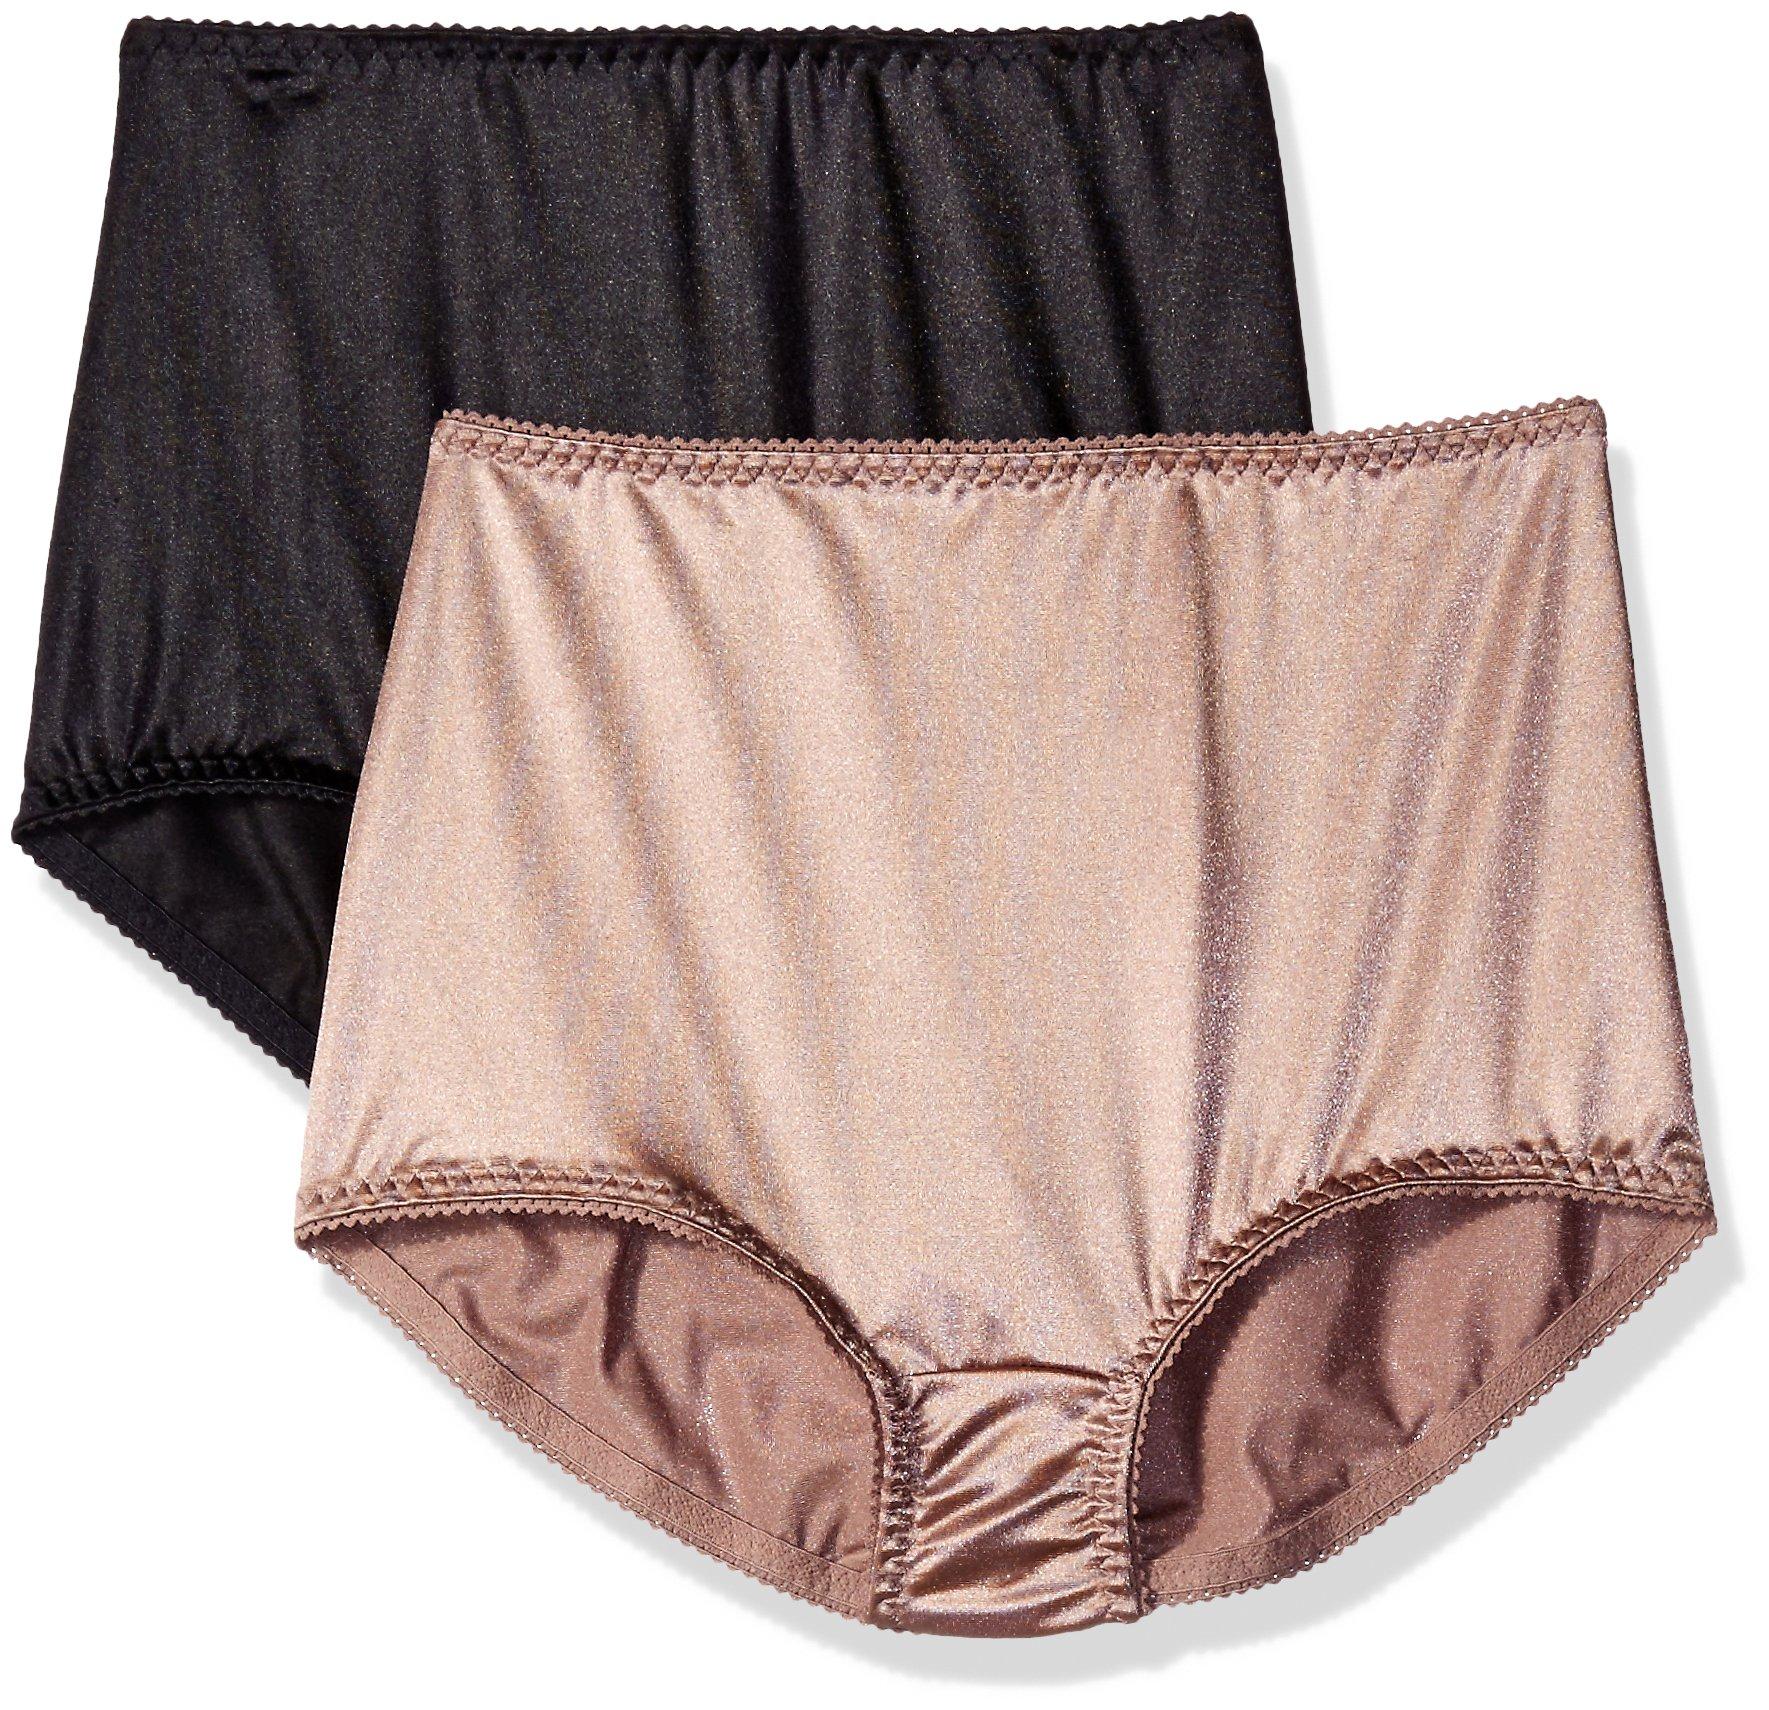 Vassarette Women's Undershapers 2-Pack Light Control Brief 40201, Walnut/Black, 3X-Large/10